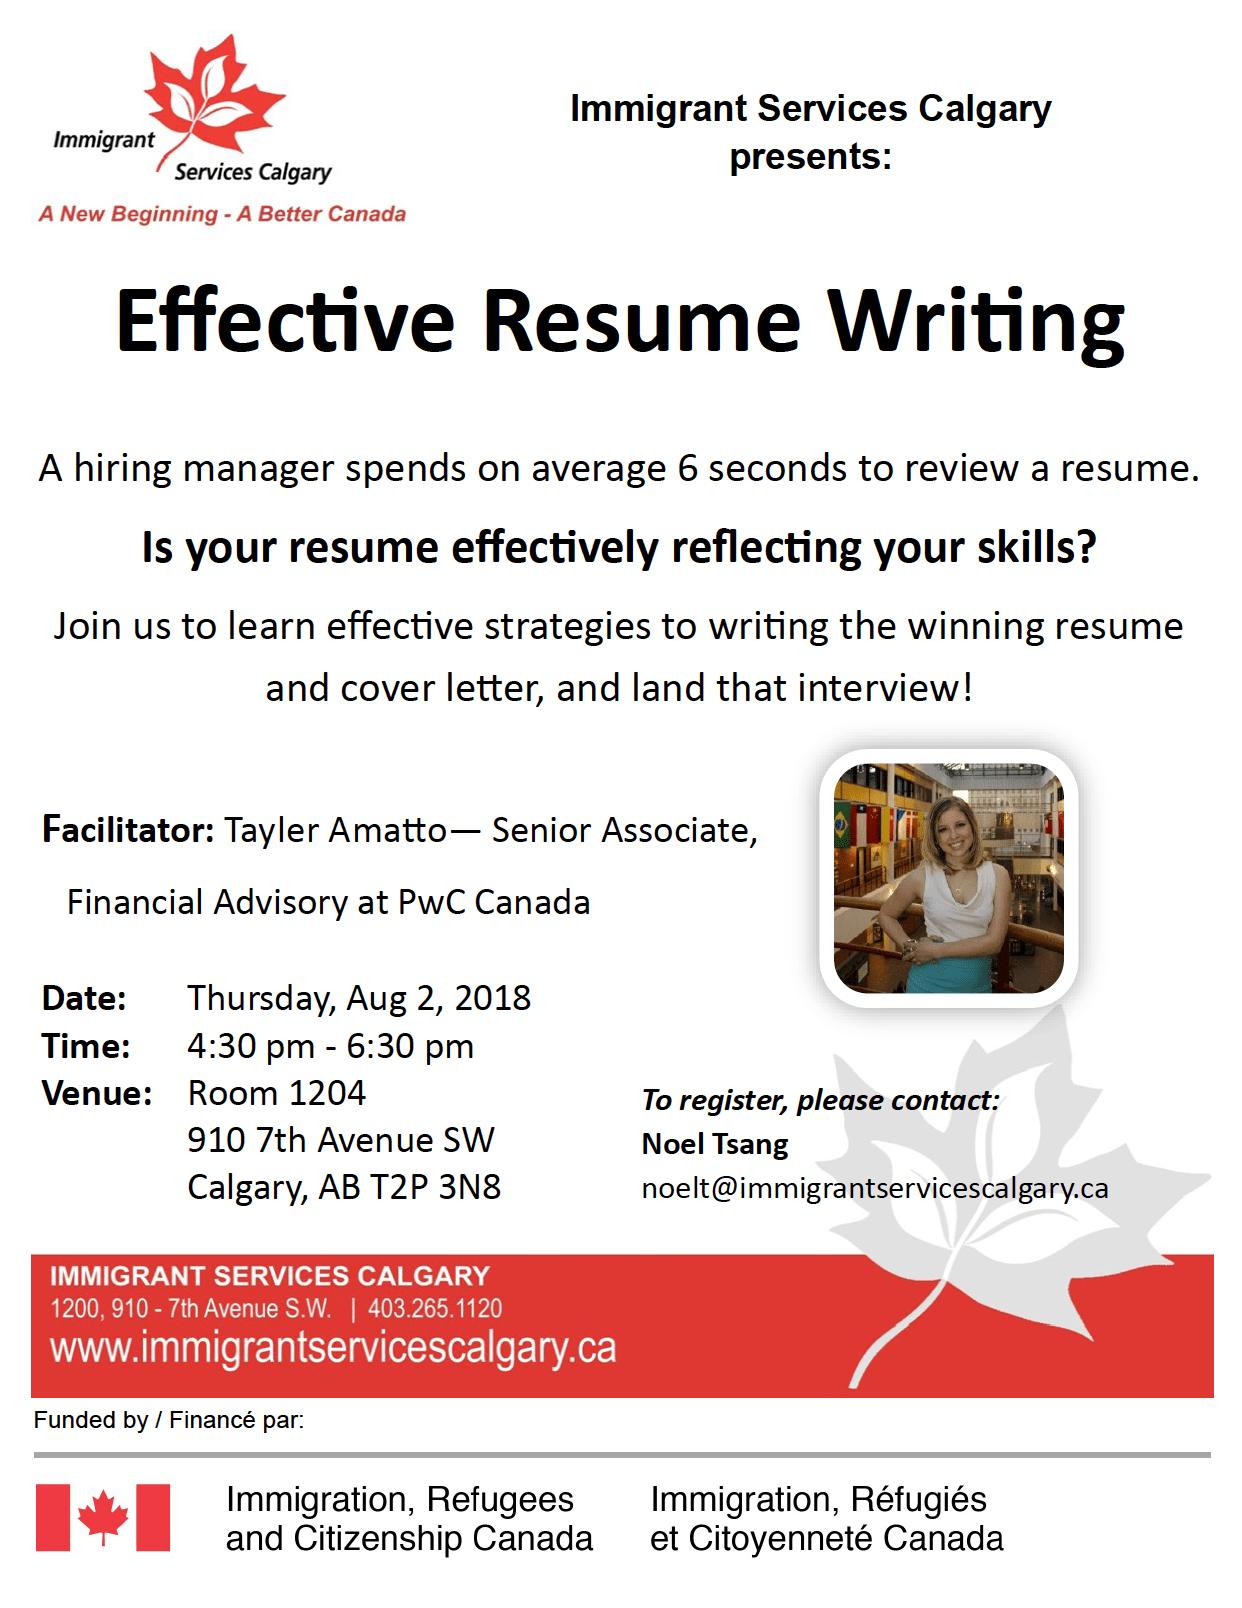 Effective Resume Writing Workshop Settlement Calgary